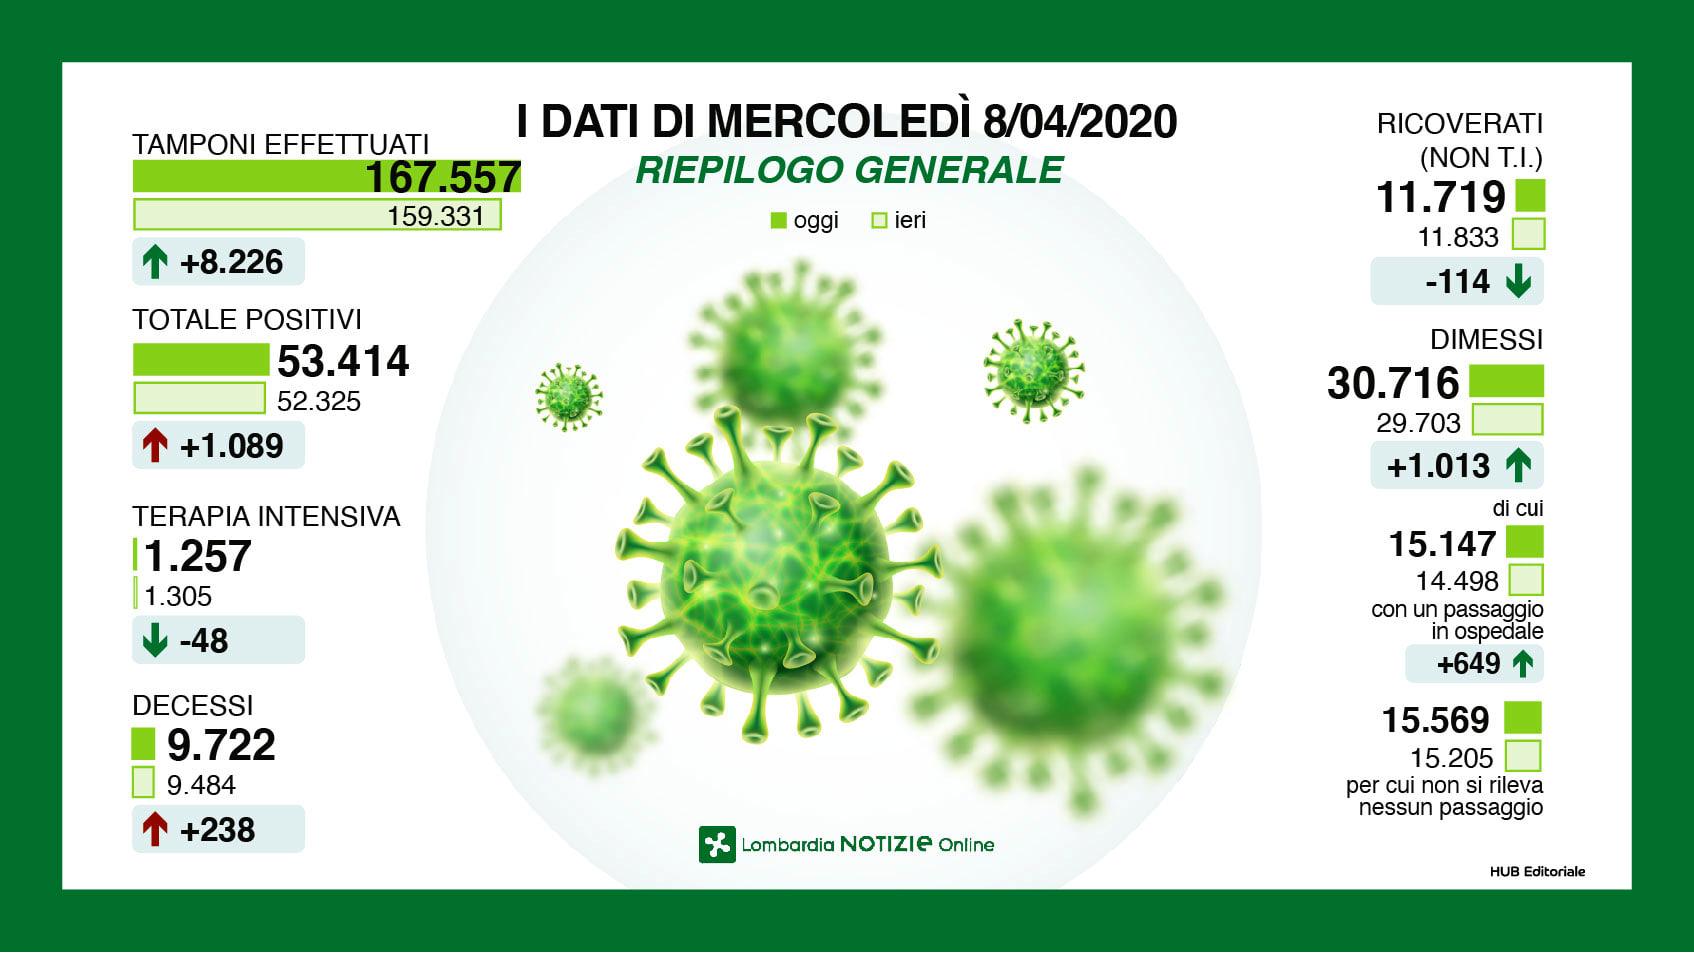 infografica tamponi coronavirus 8 aprile 2020-2